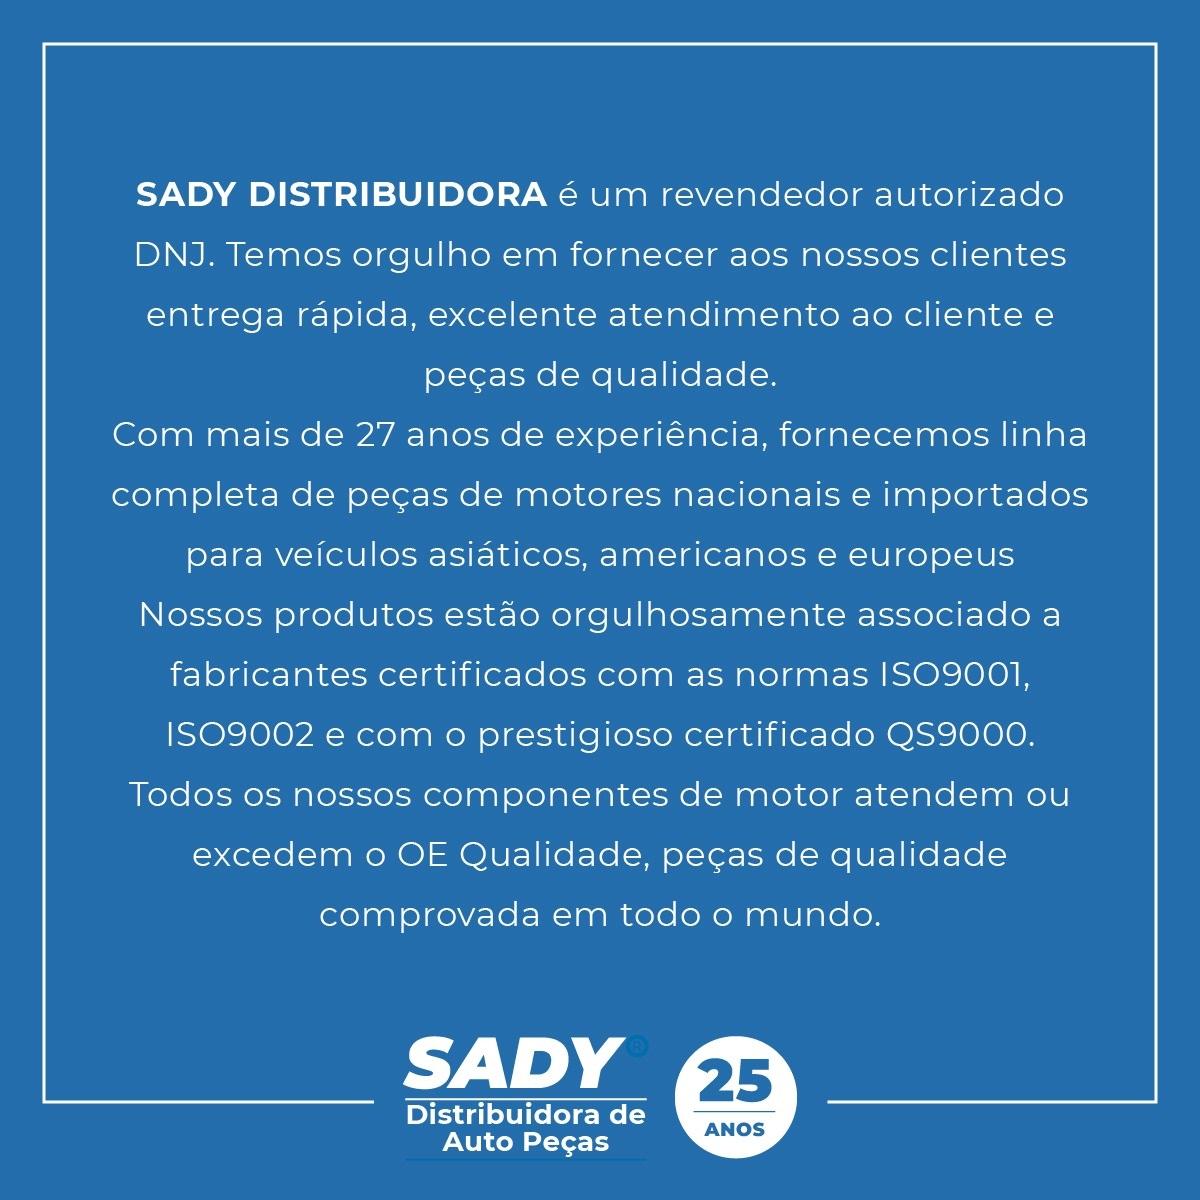 BOMBA DE OLEO DO MOTOR FORD 2.2/3.2 TDI 12/...